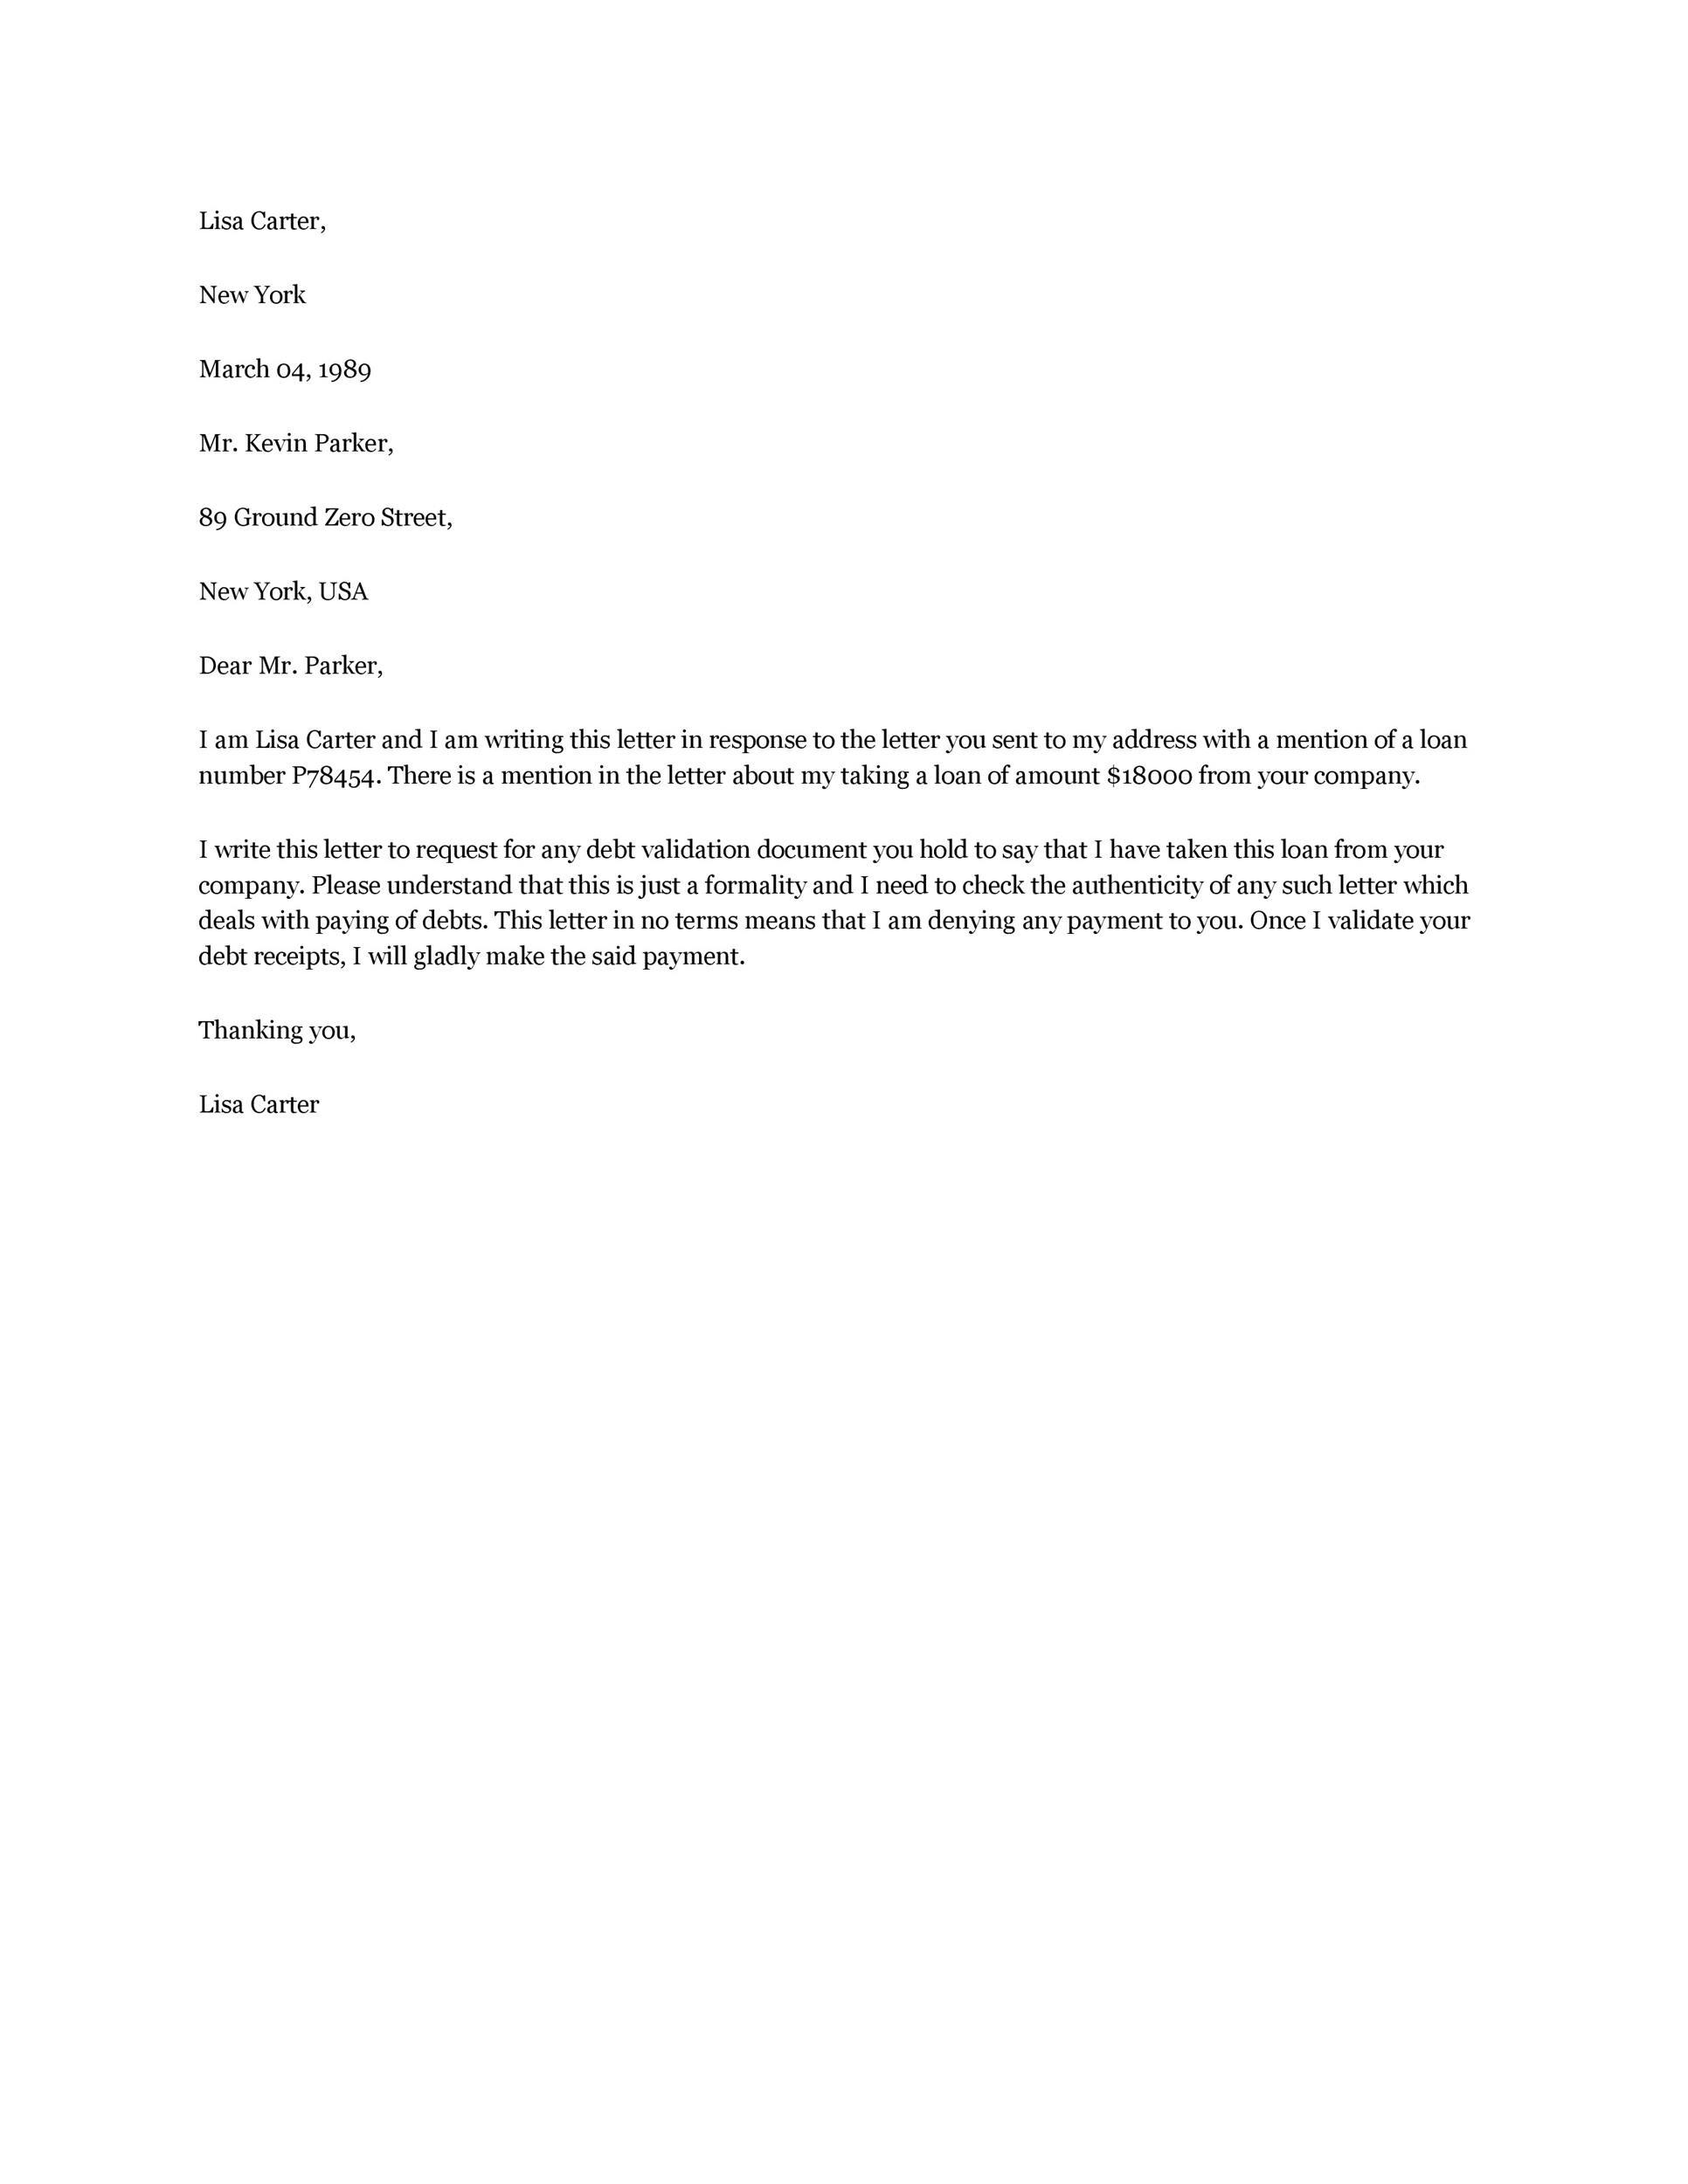 Free debt validation letter 50